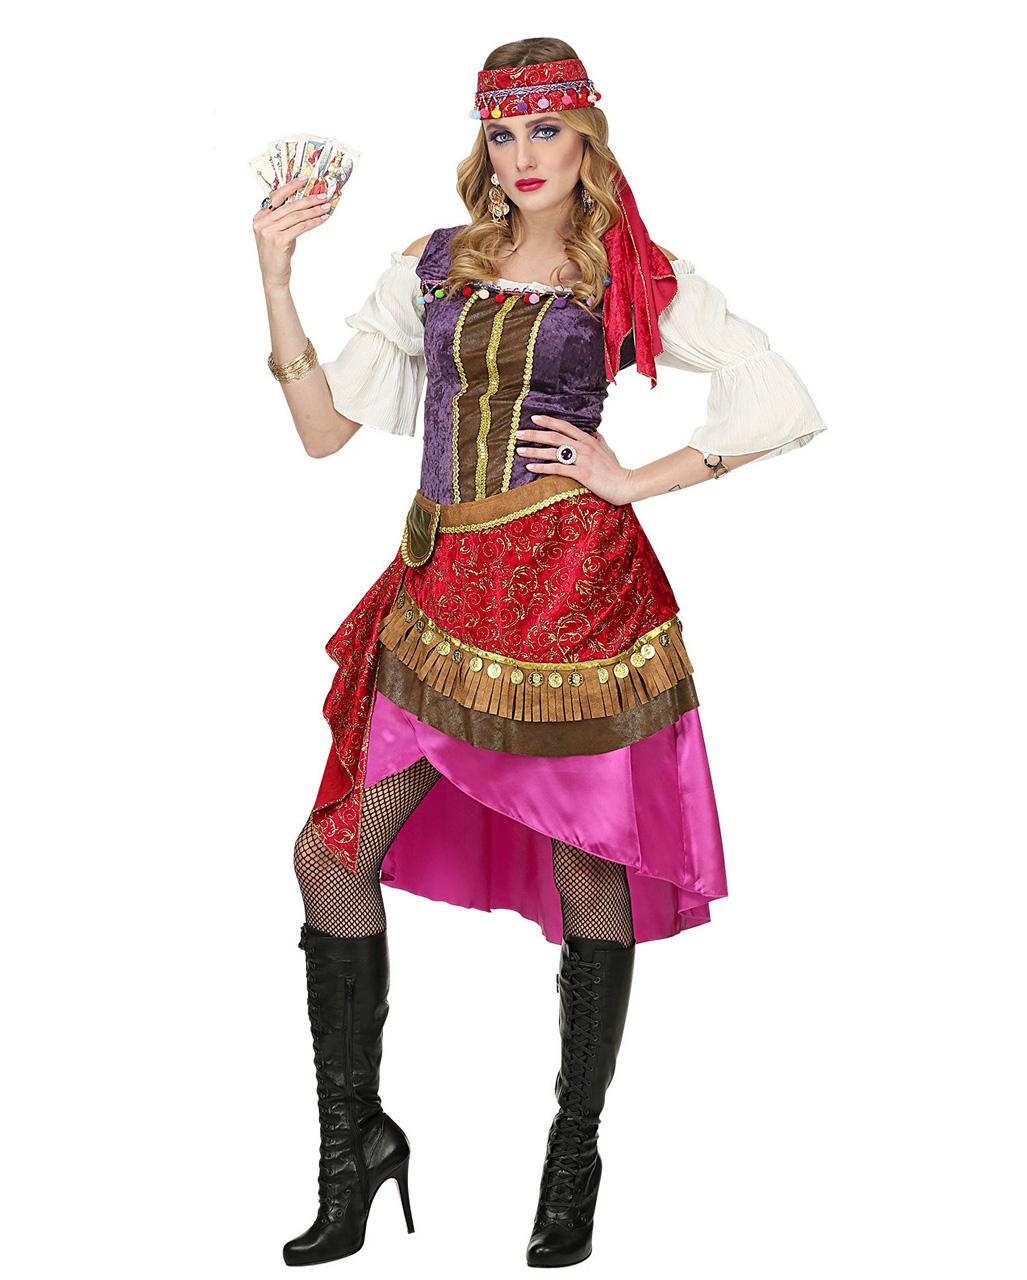 Zigeunerin Kostum Fur Karneval Horror Shop Com